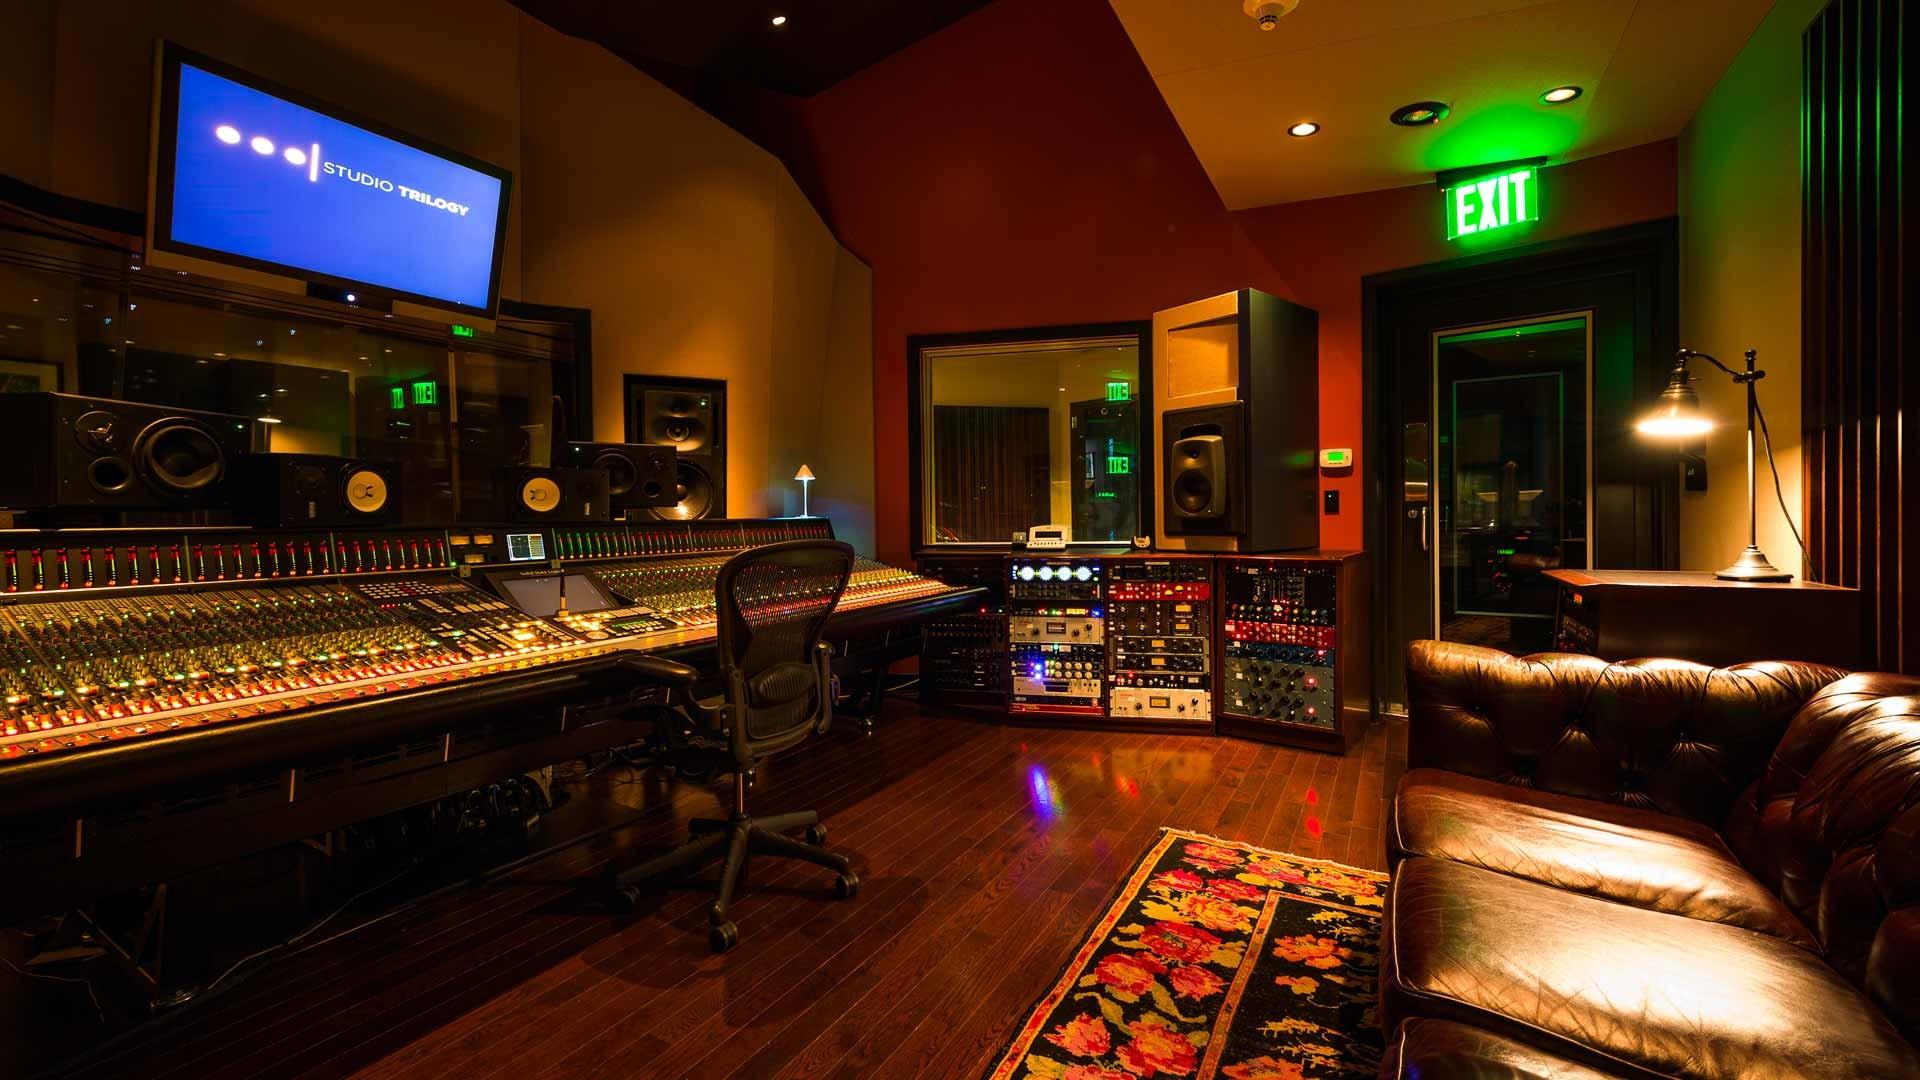 Music Recording Studio HD Wallpaper (74+ Images